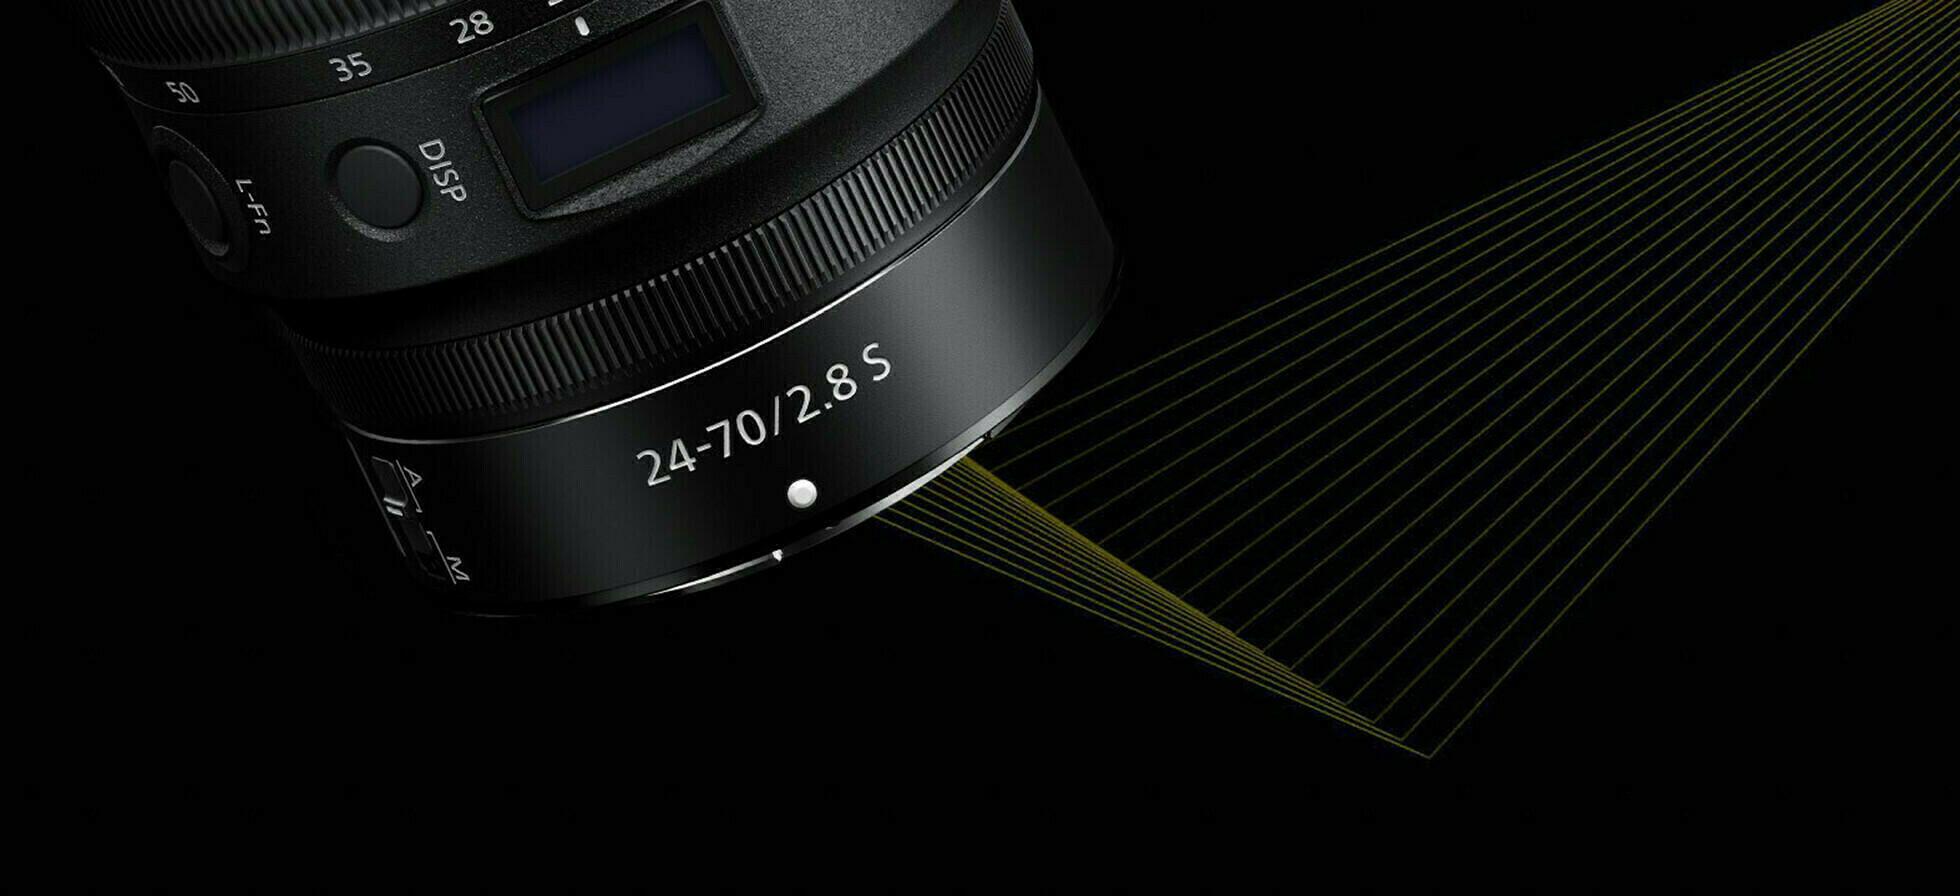 Nikon Z 24-70 mm f/2.8 S - Bannière